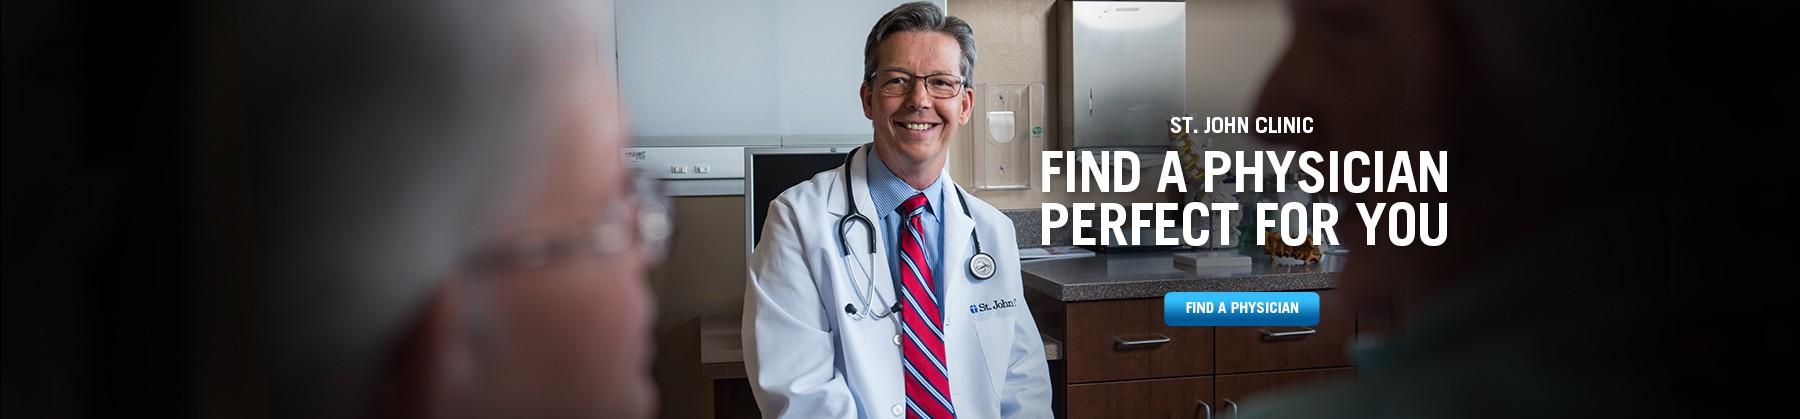 Find A Physician Alt